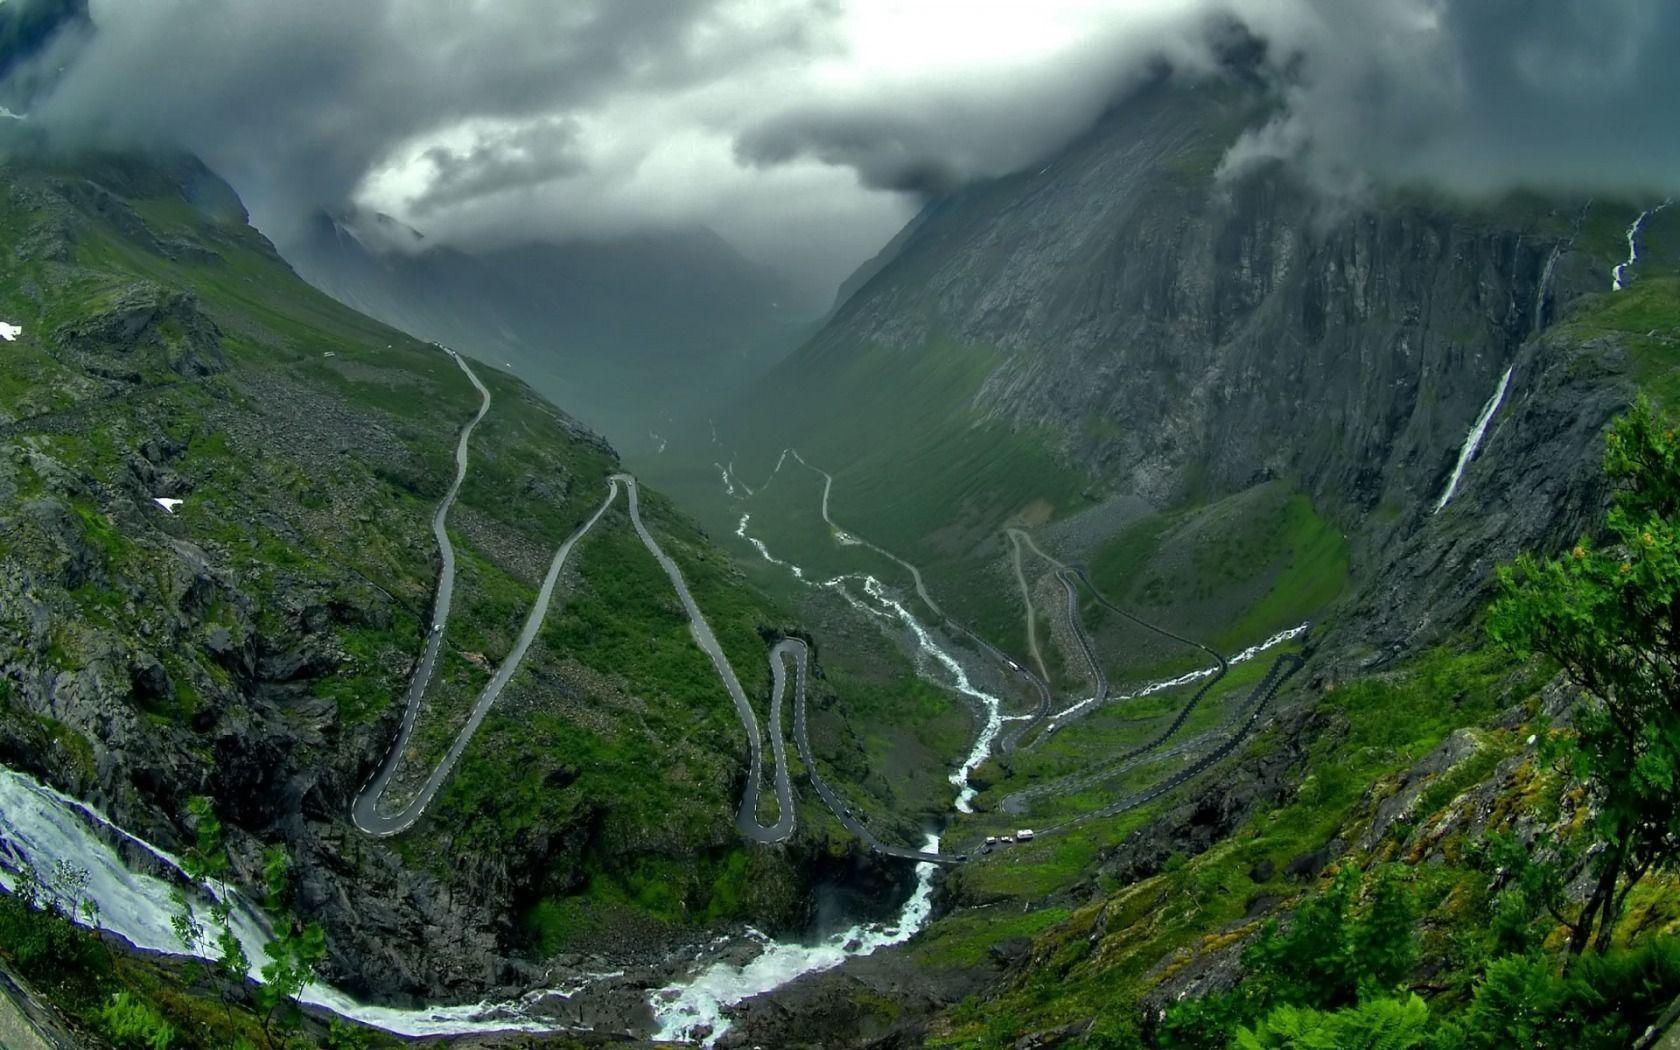 vallee_fonds-ecran-gratuits_paysage_3